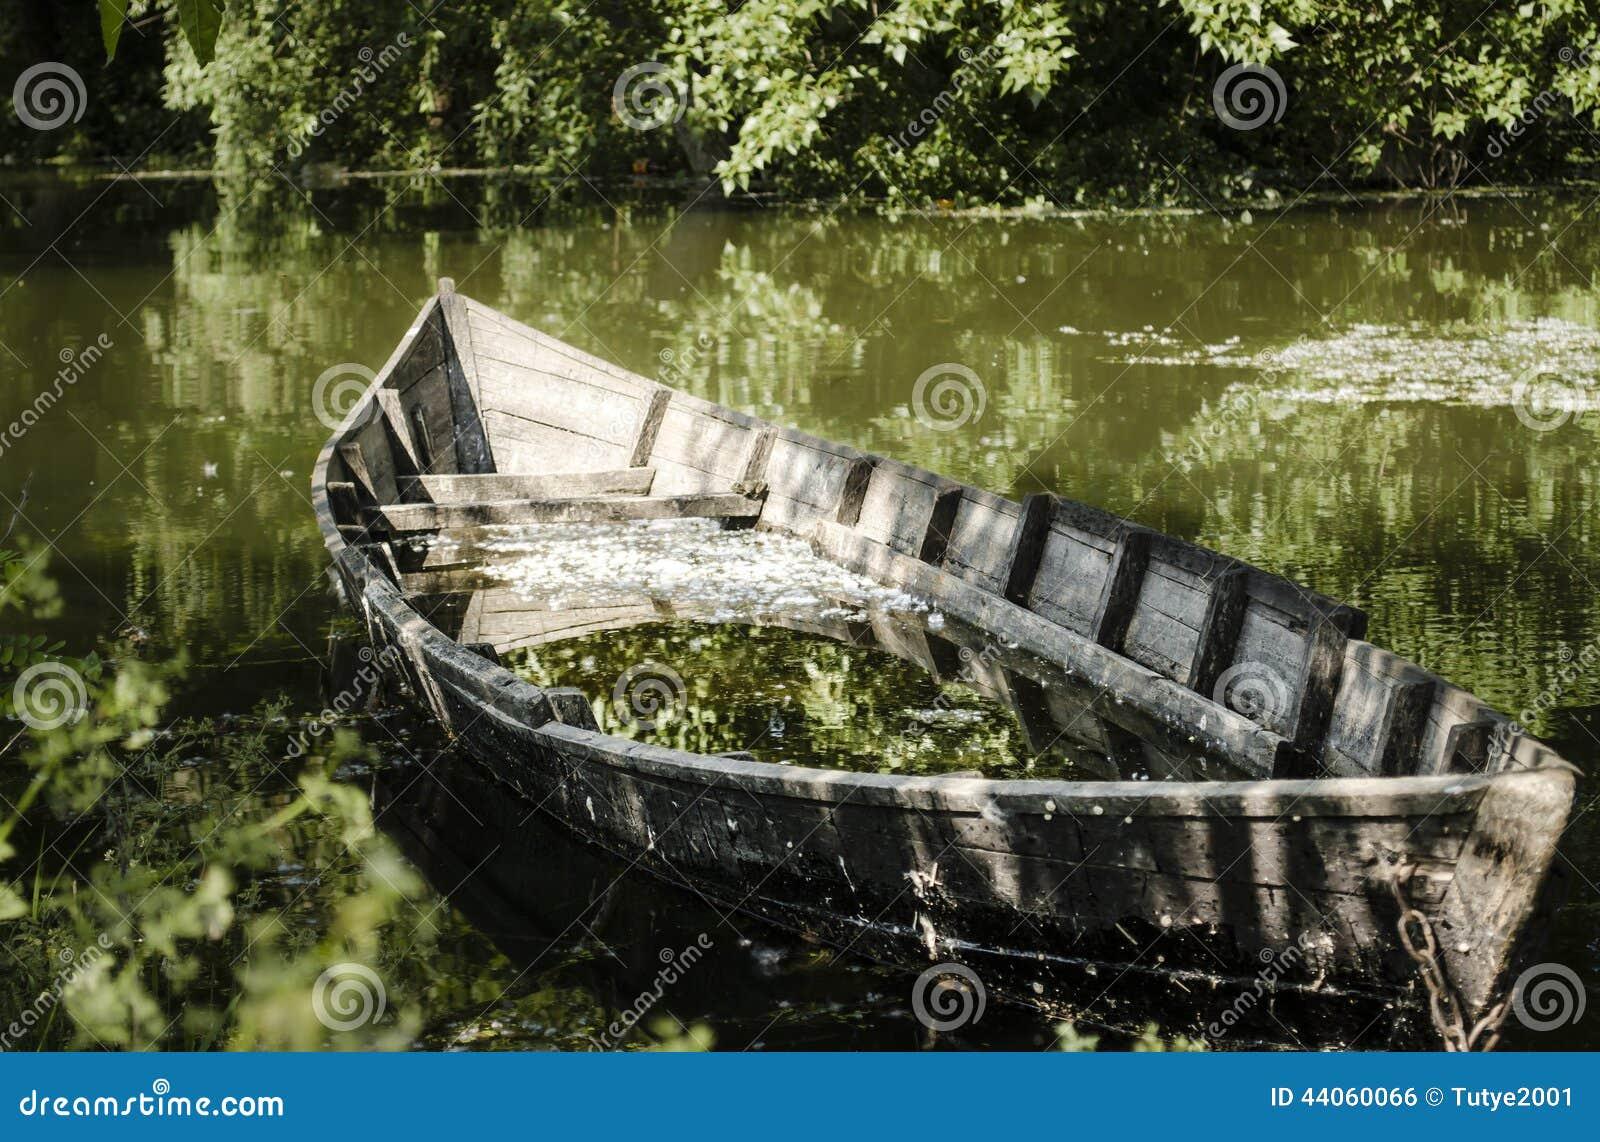 image Broken boat with nacho vidal